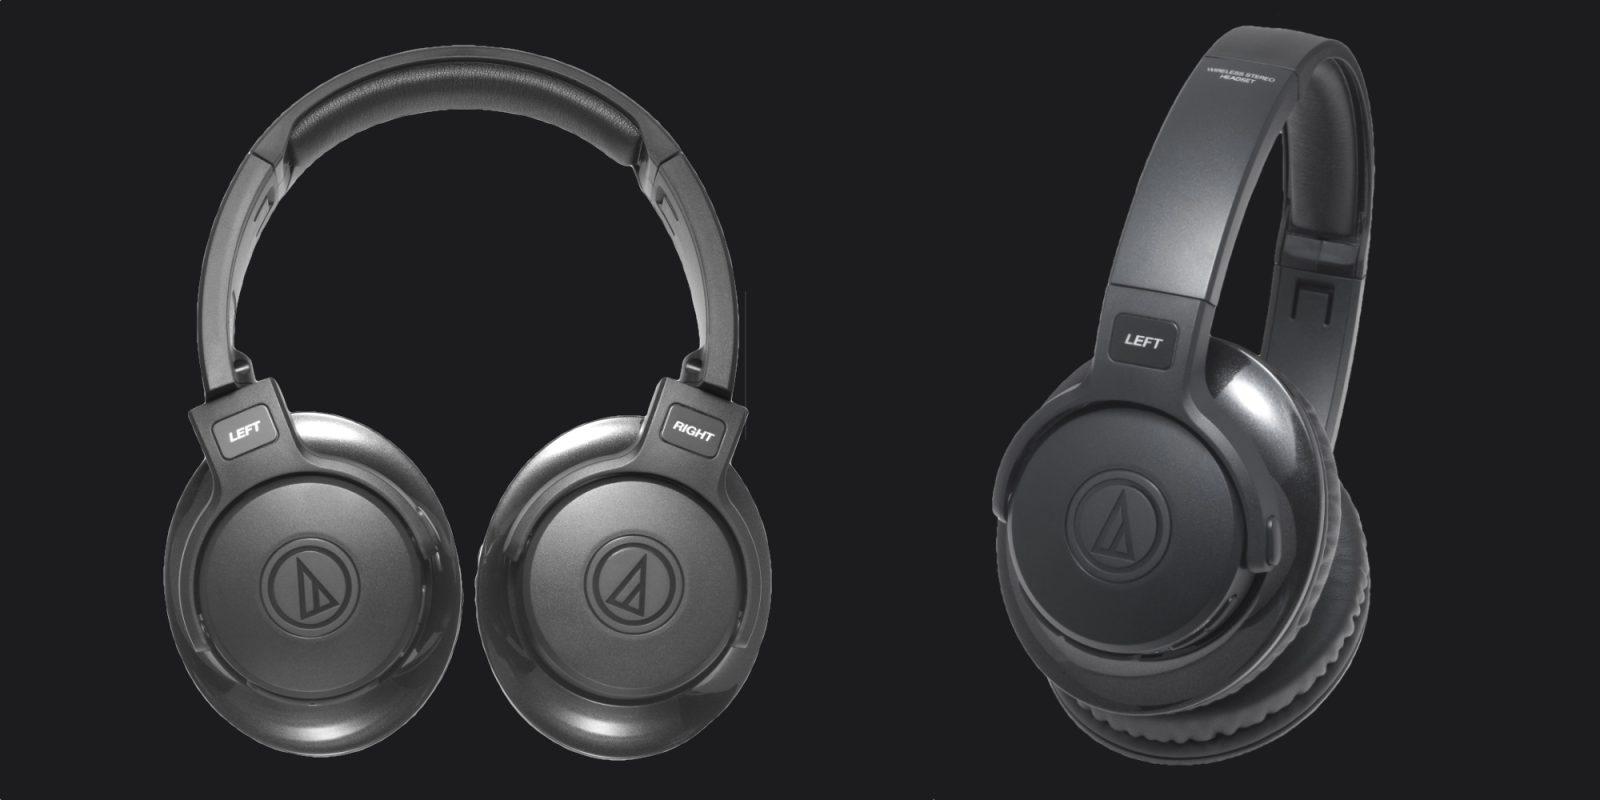 Score Audio-Technica's Bluetooth Headphones on sale for $96 (Reg. $129)